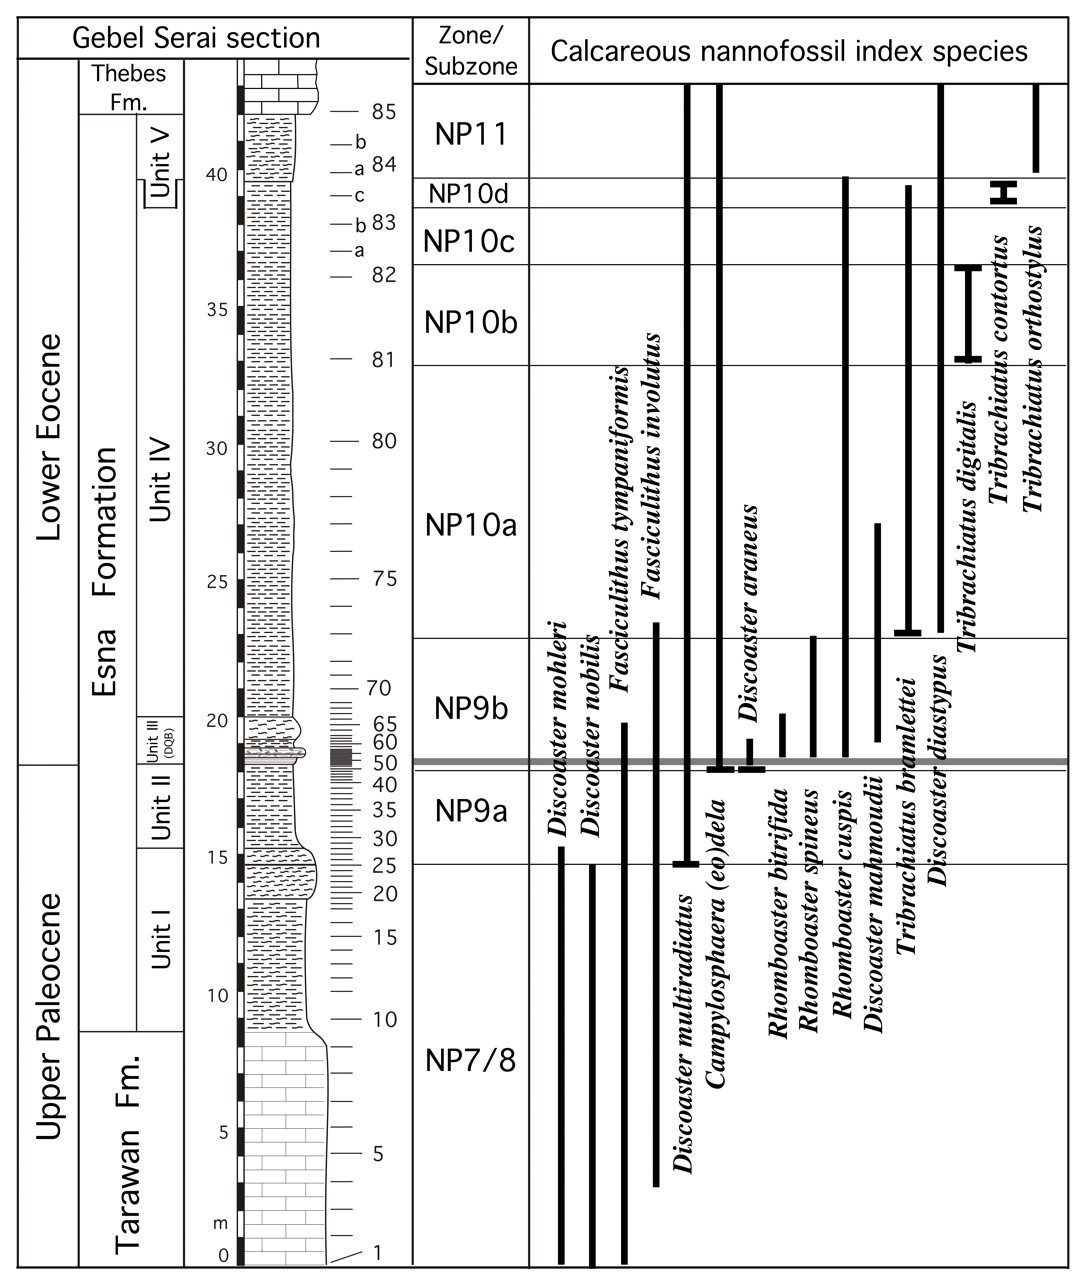 Calcareous Nannofossils Of The Paleocene Eocene Transition At Qena